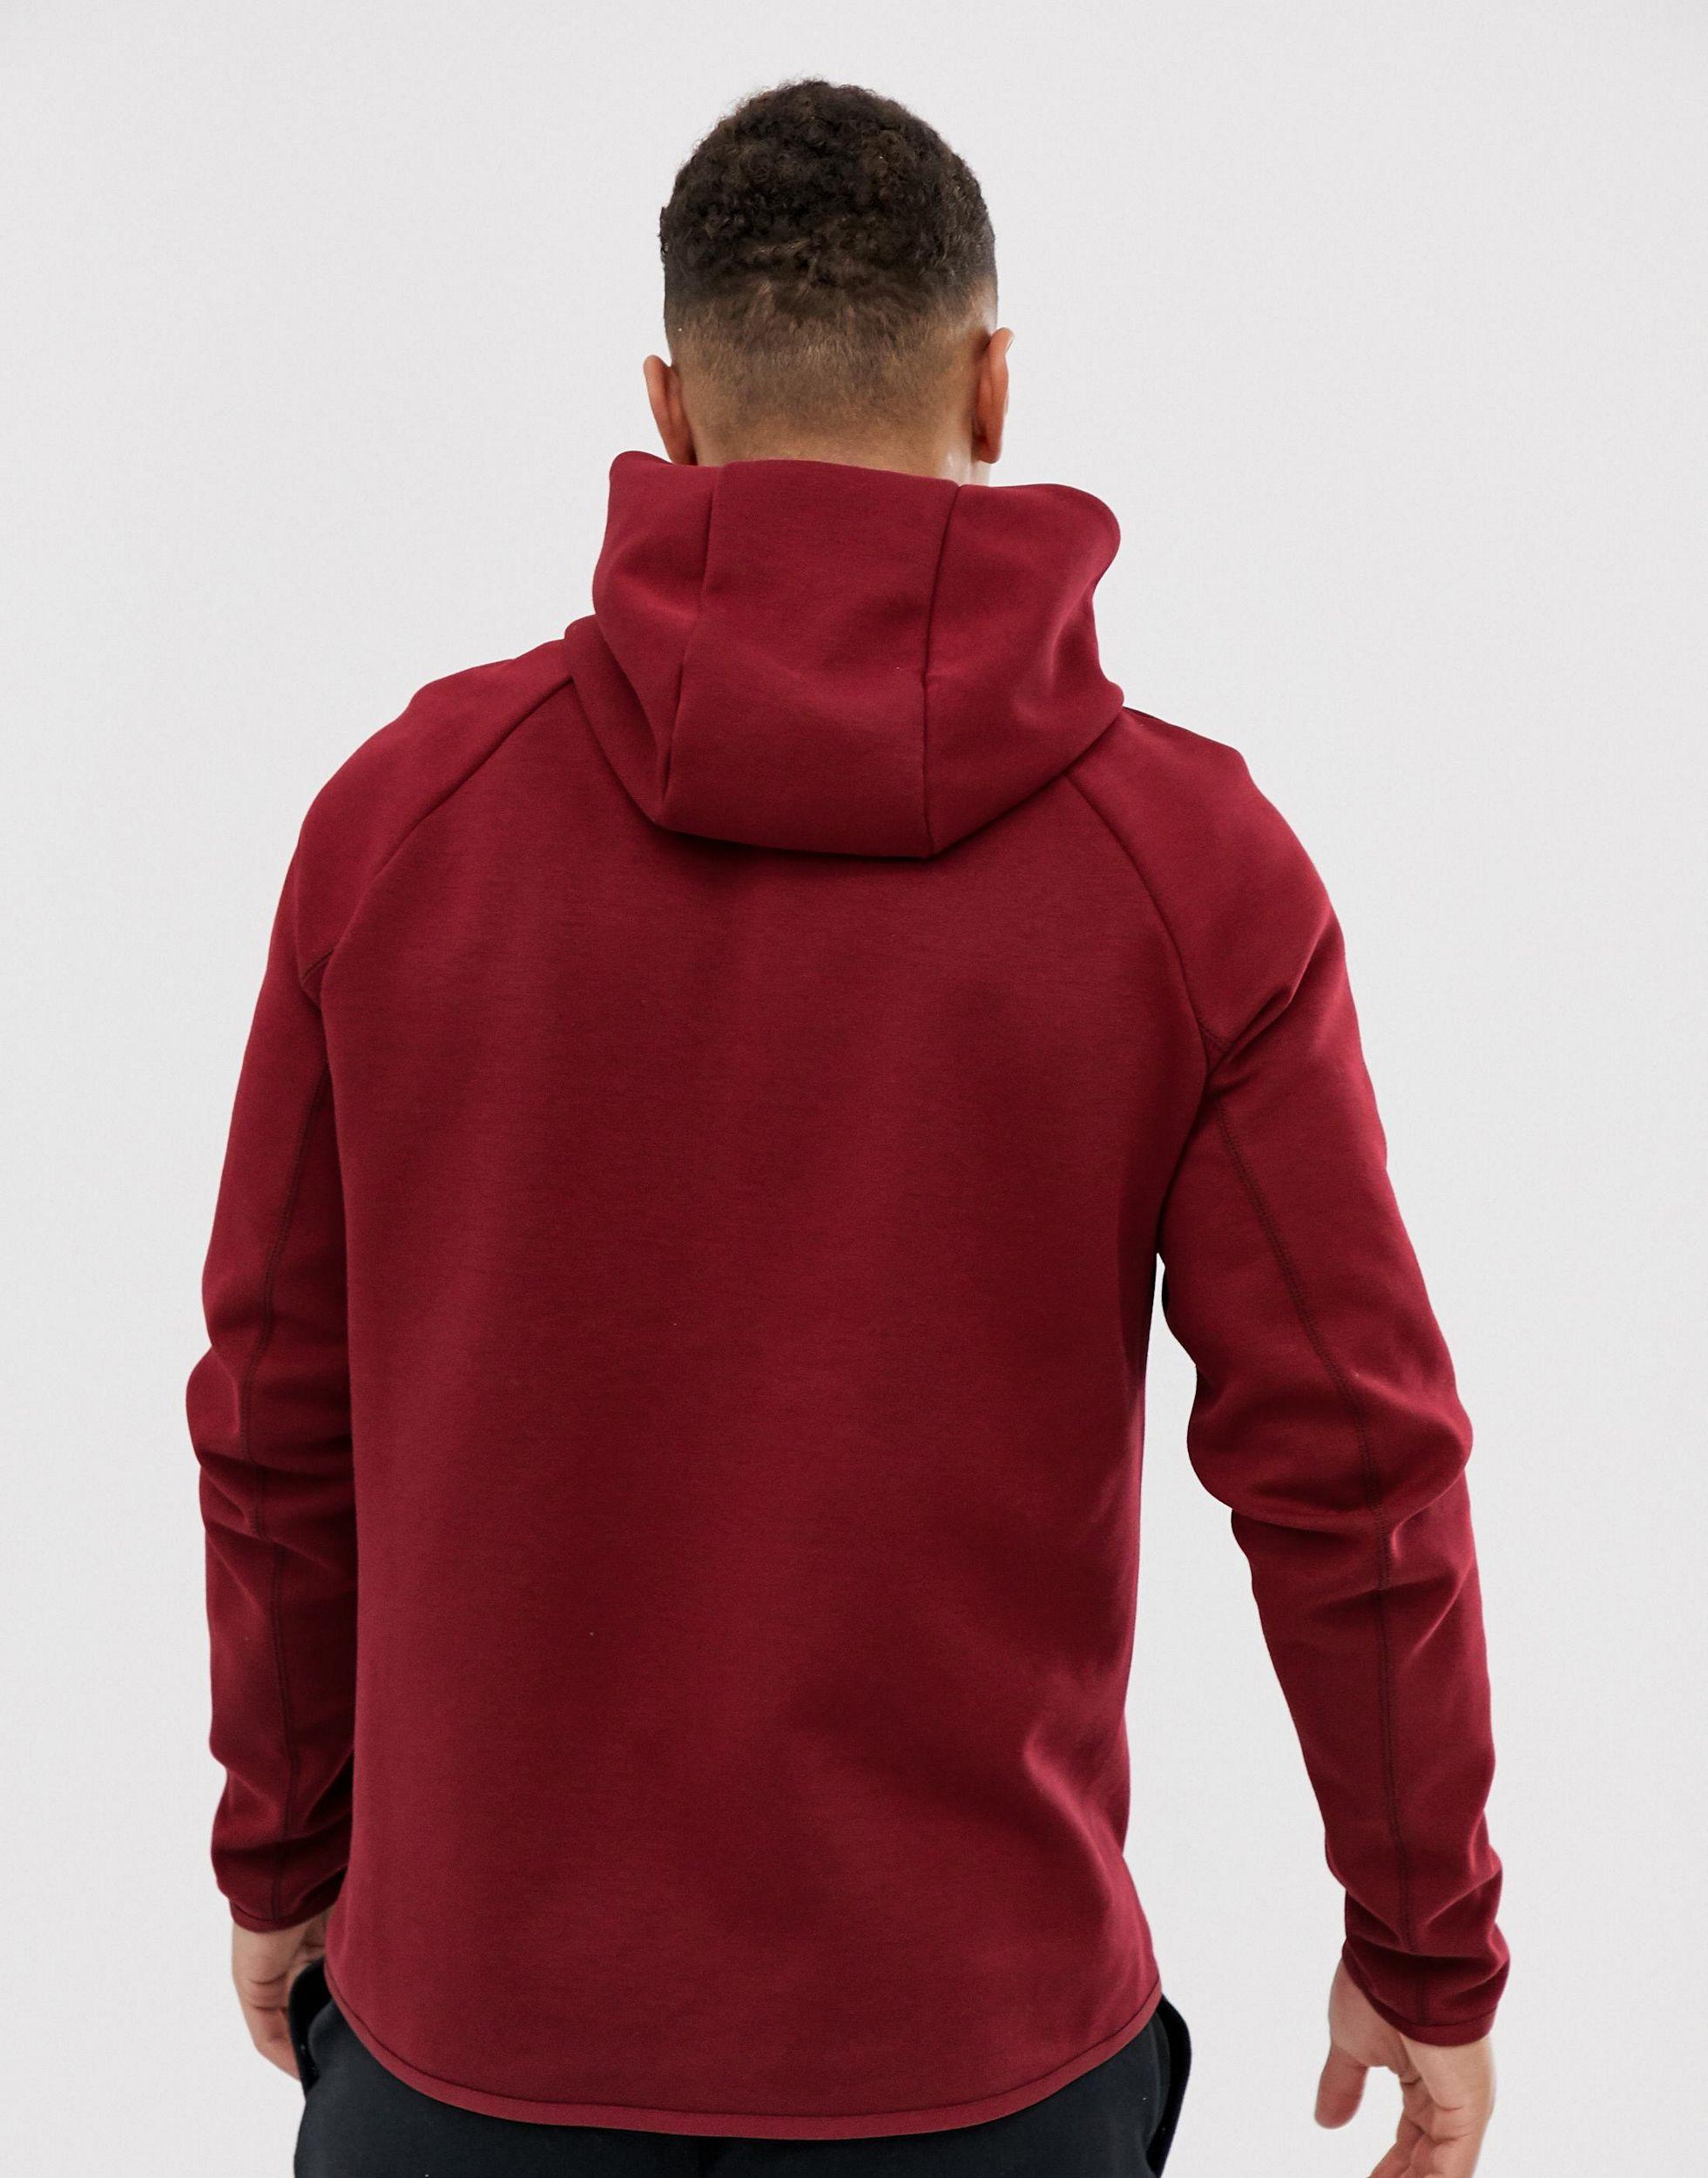 Nike Tech Fleece Hoodie Burgundy In Red For Men Lyst